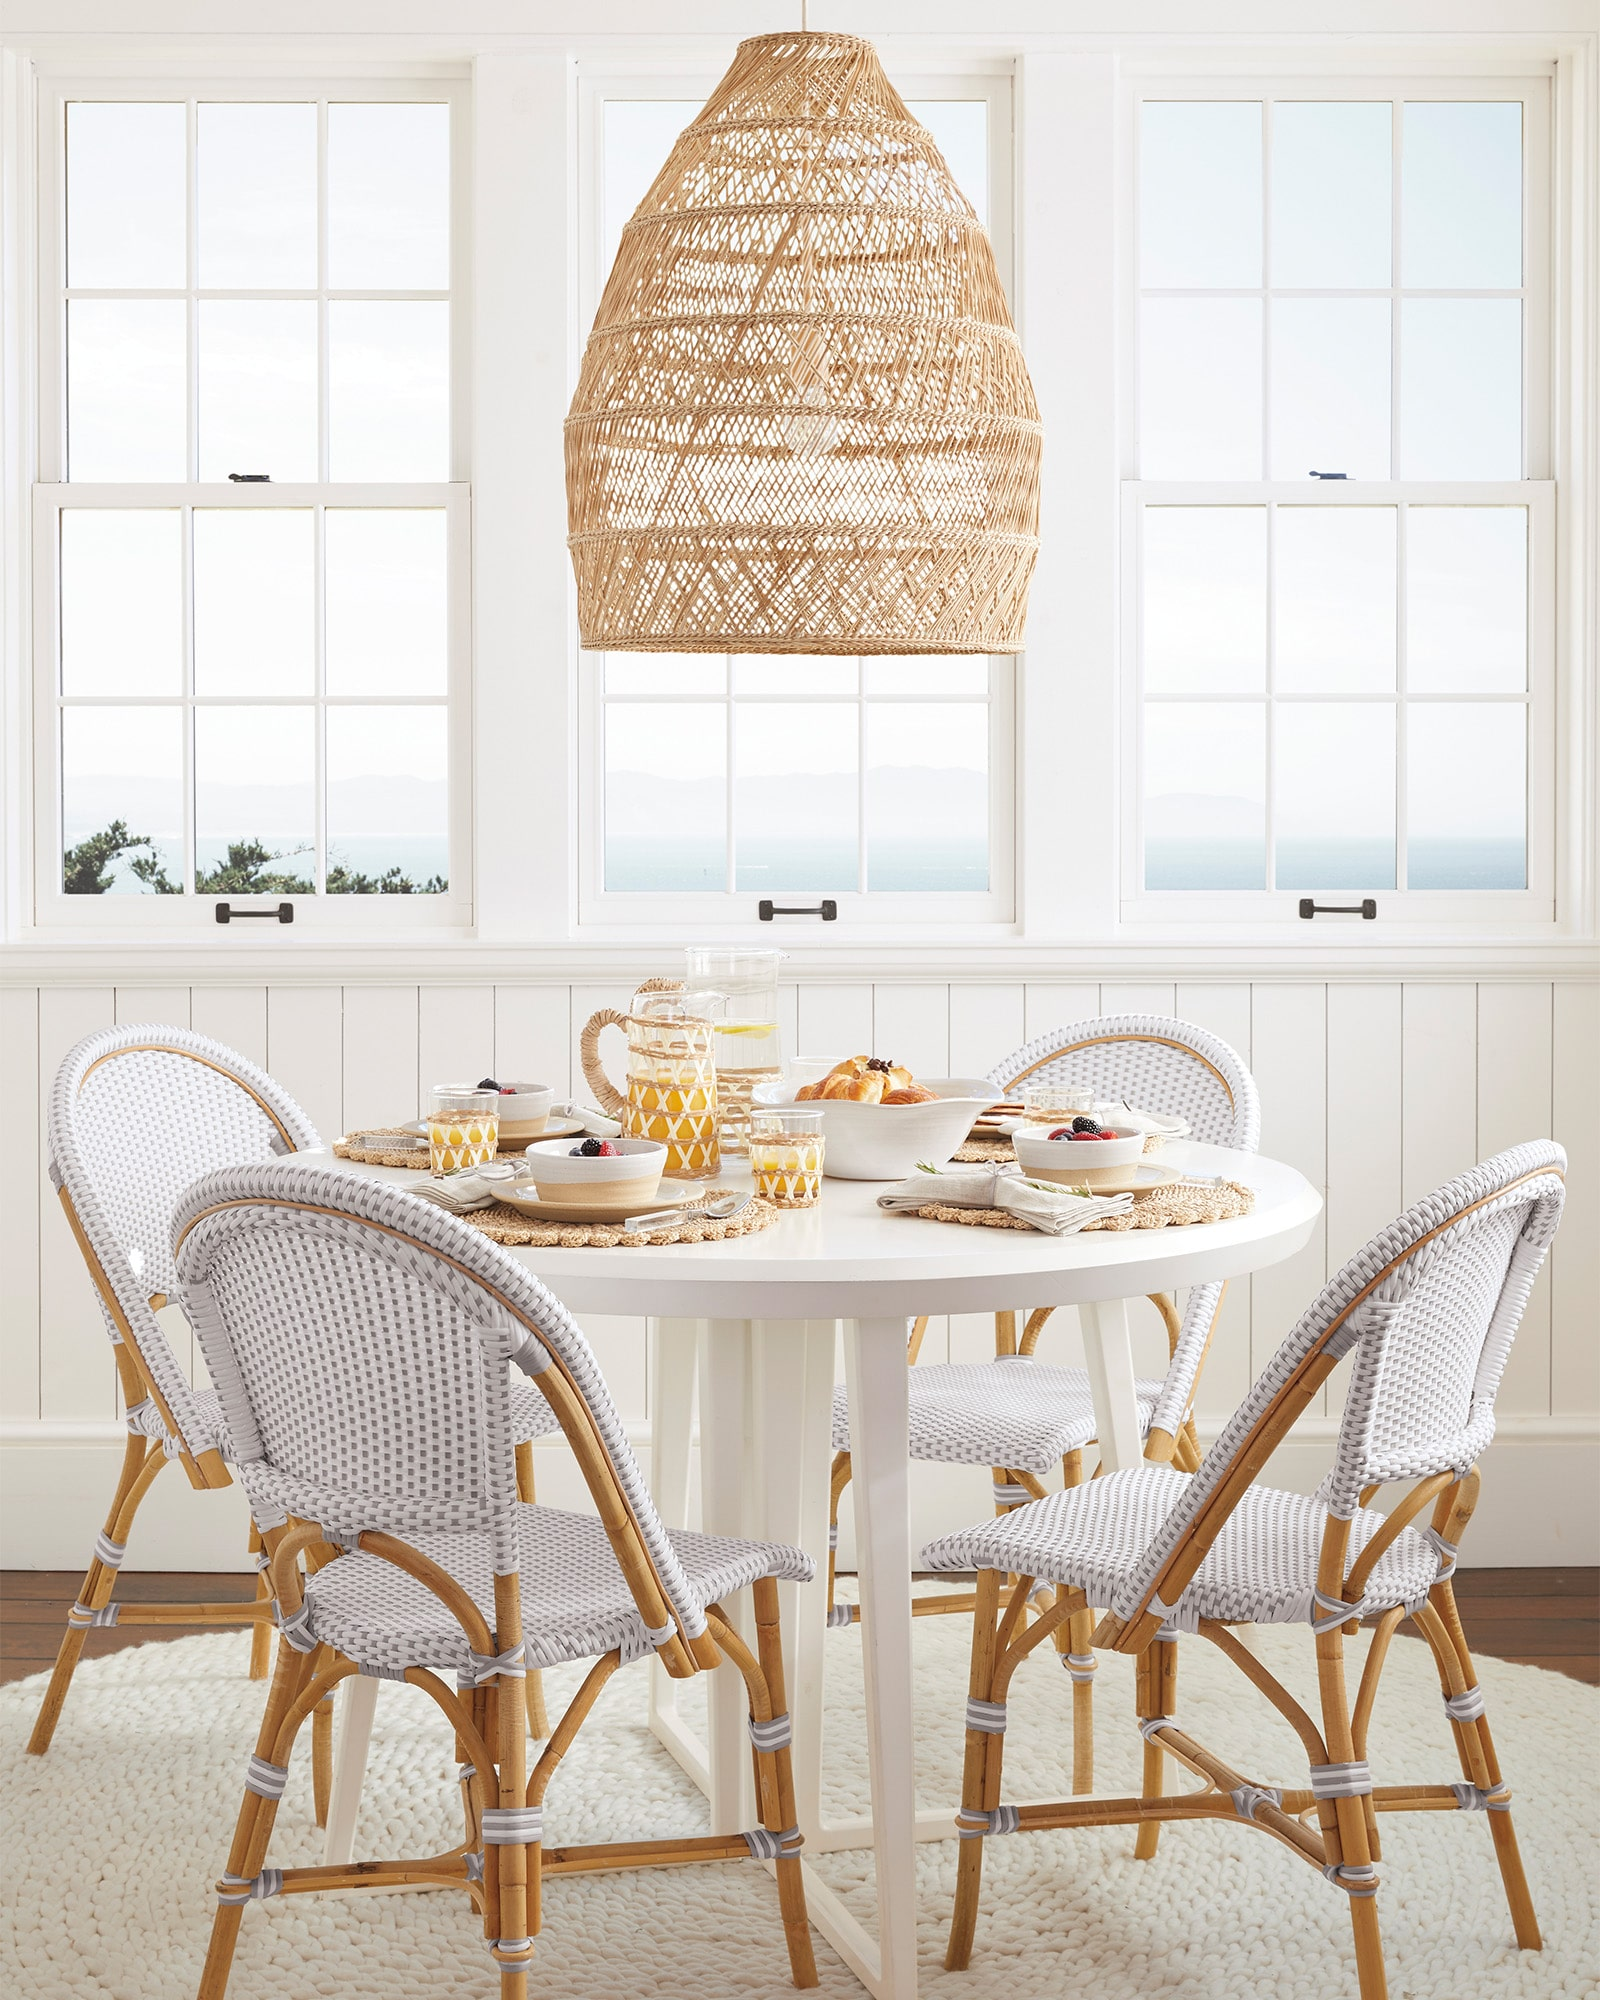 Rattan Pendant Light over a Breakfast Nook